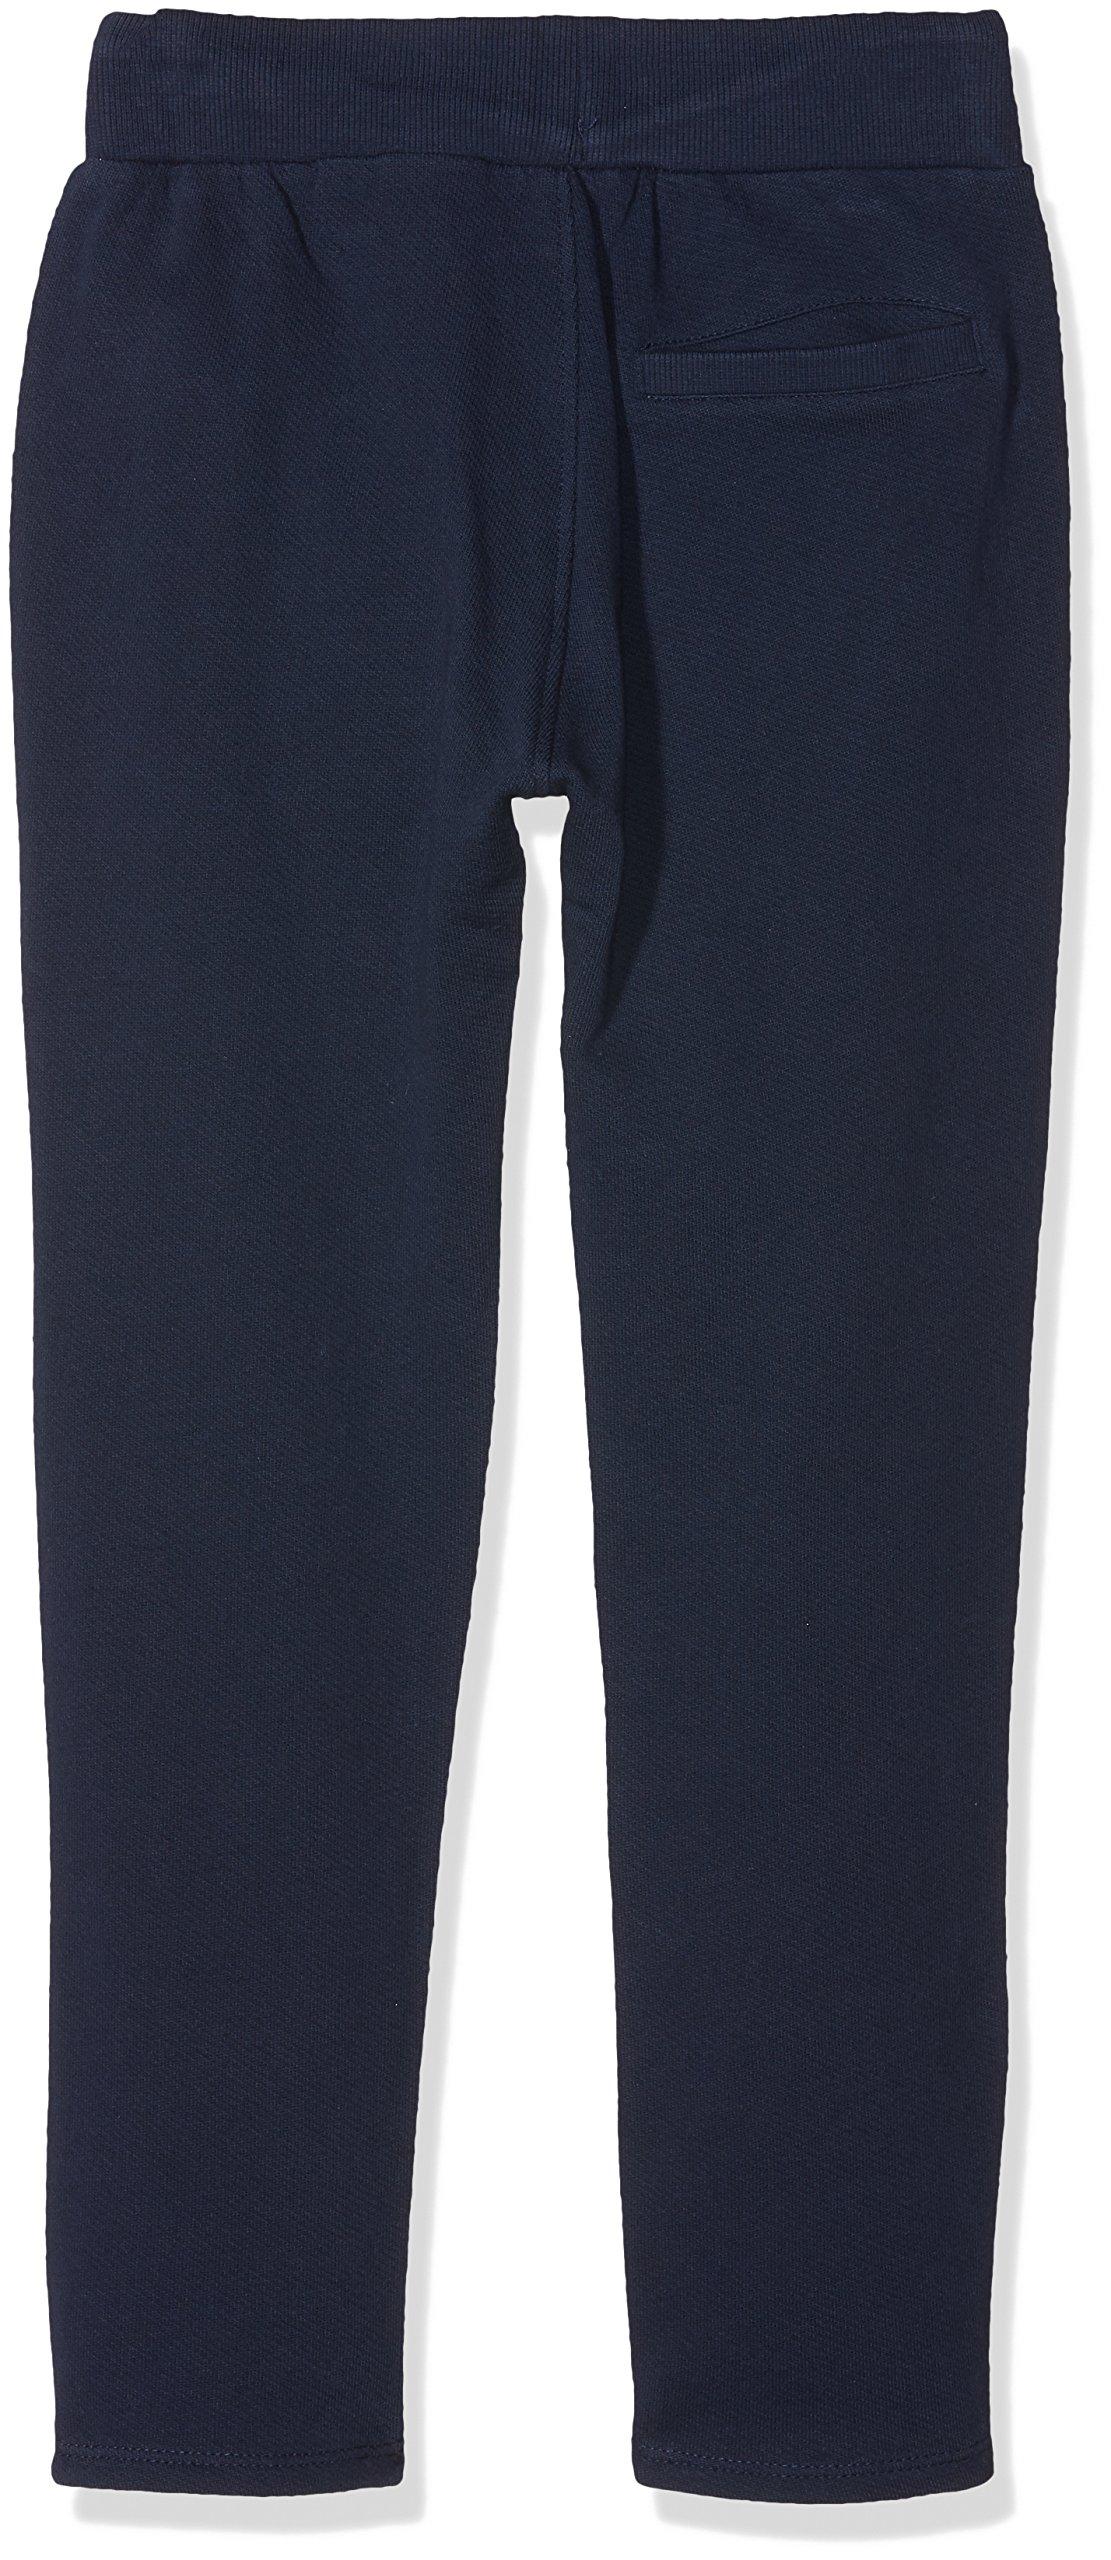 Tommy Hilfiger Ame Hilfiger Sweatpant Pantalones para Niños